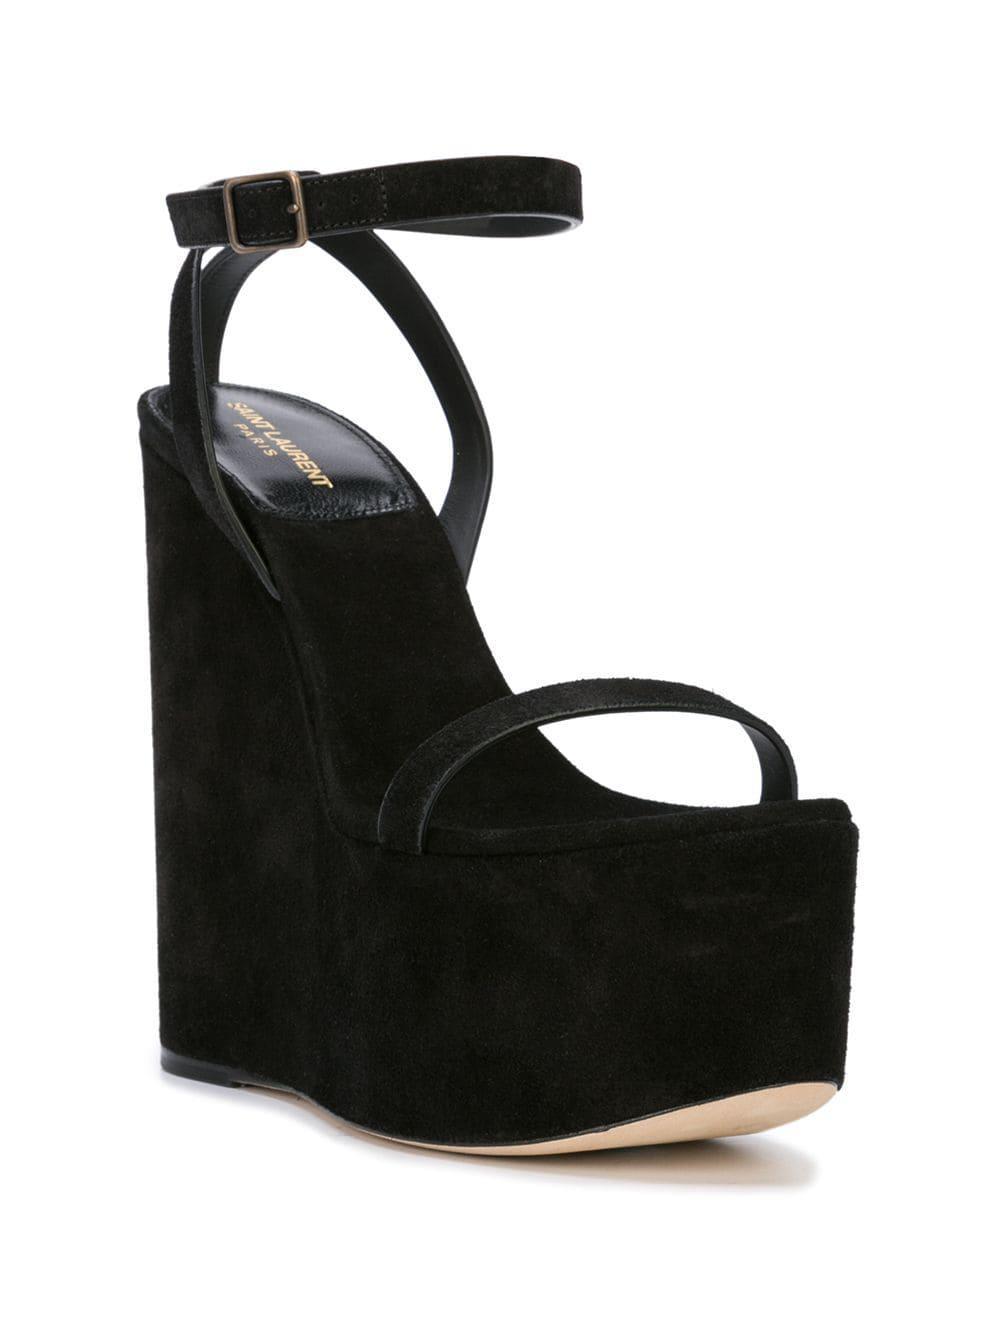 81988e12cf8 Saint Laurent Espadrille Wedge Sandals in Black - Lyst